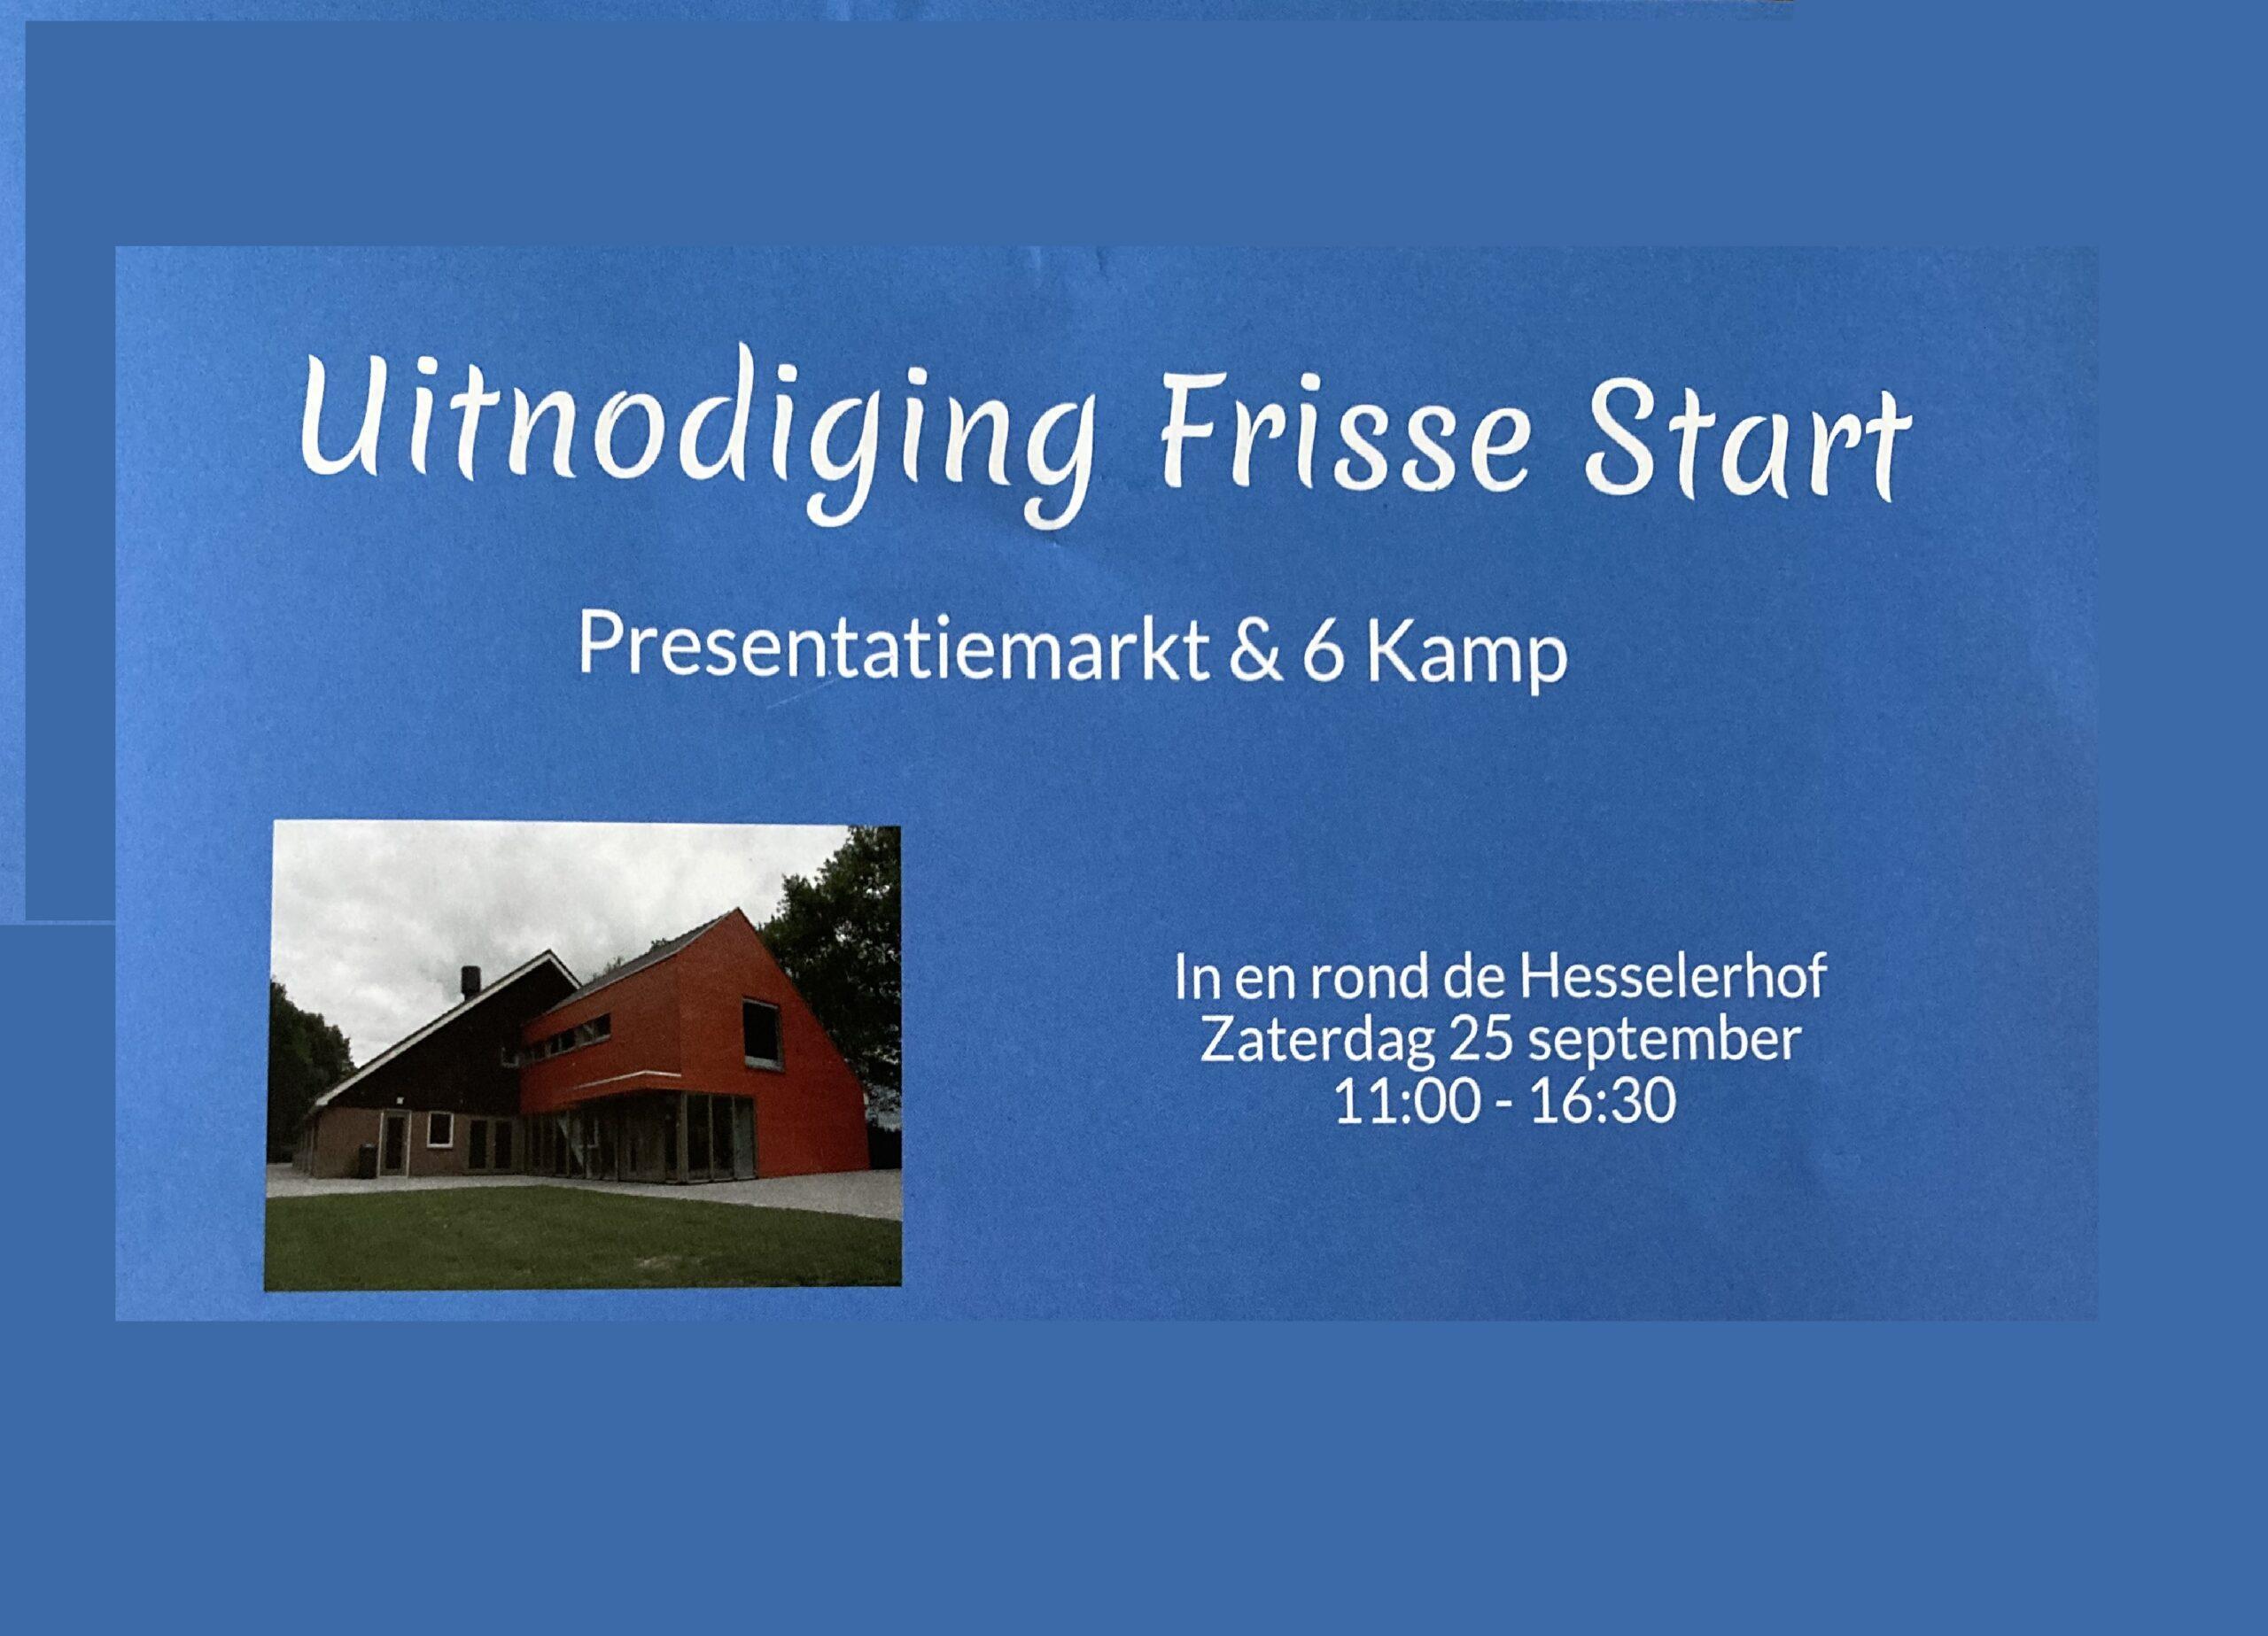 frisse-start